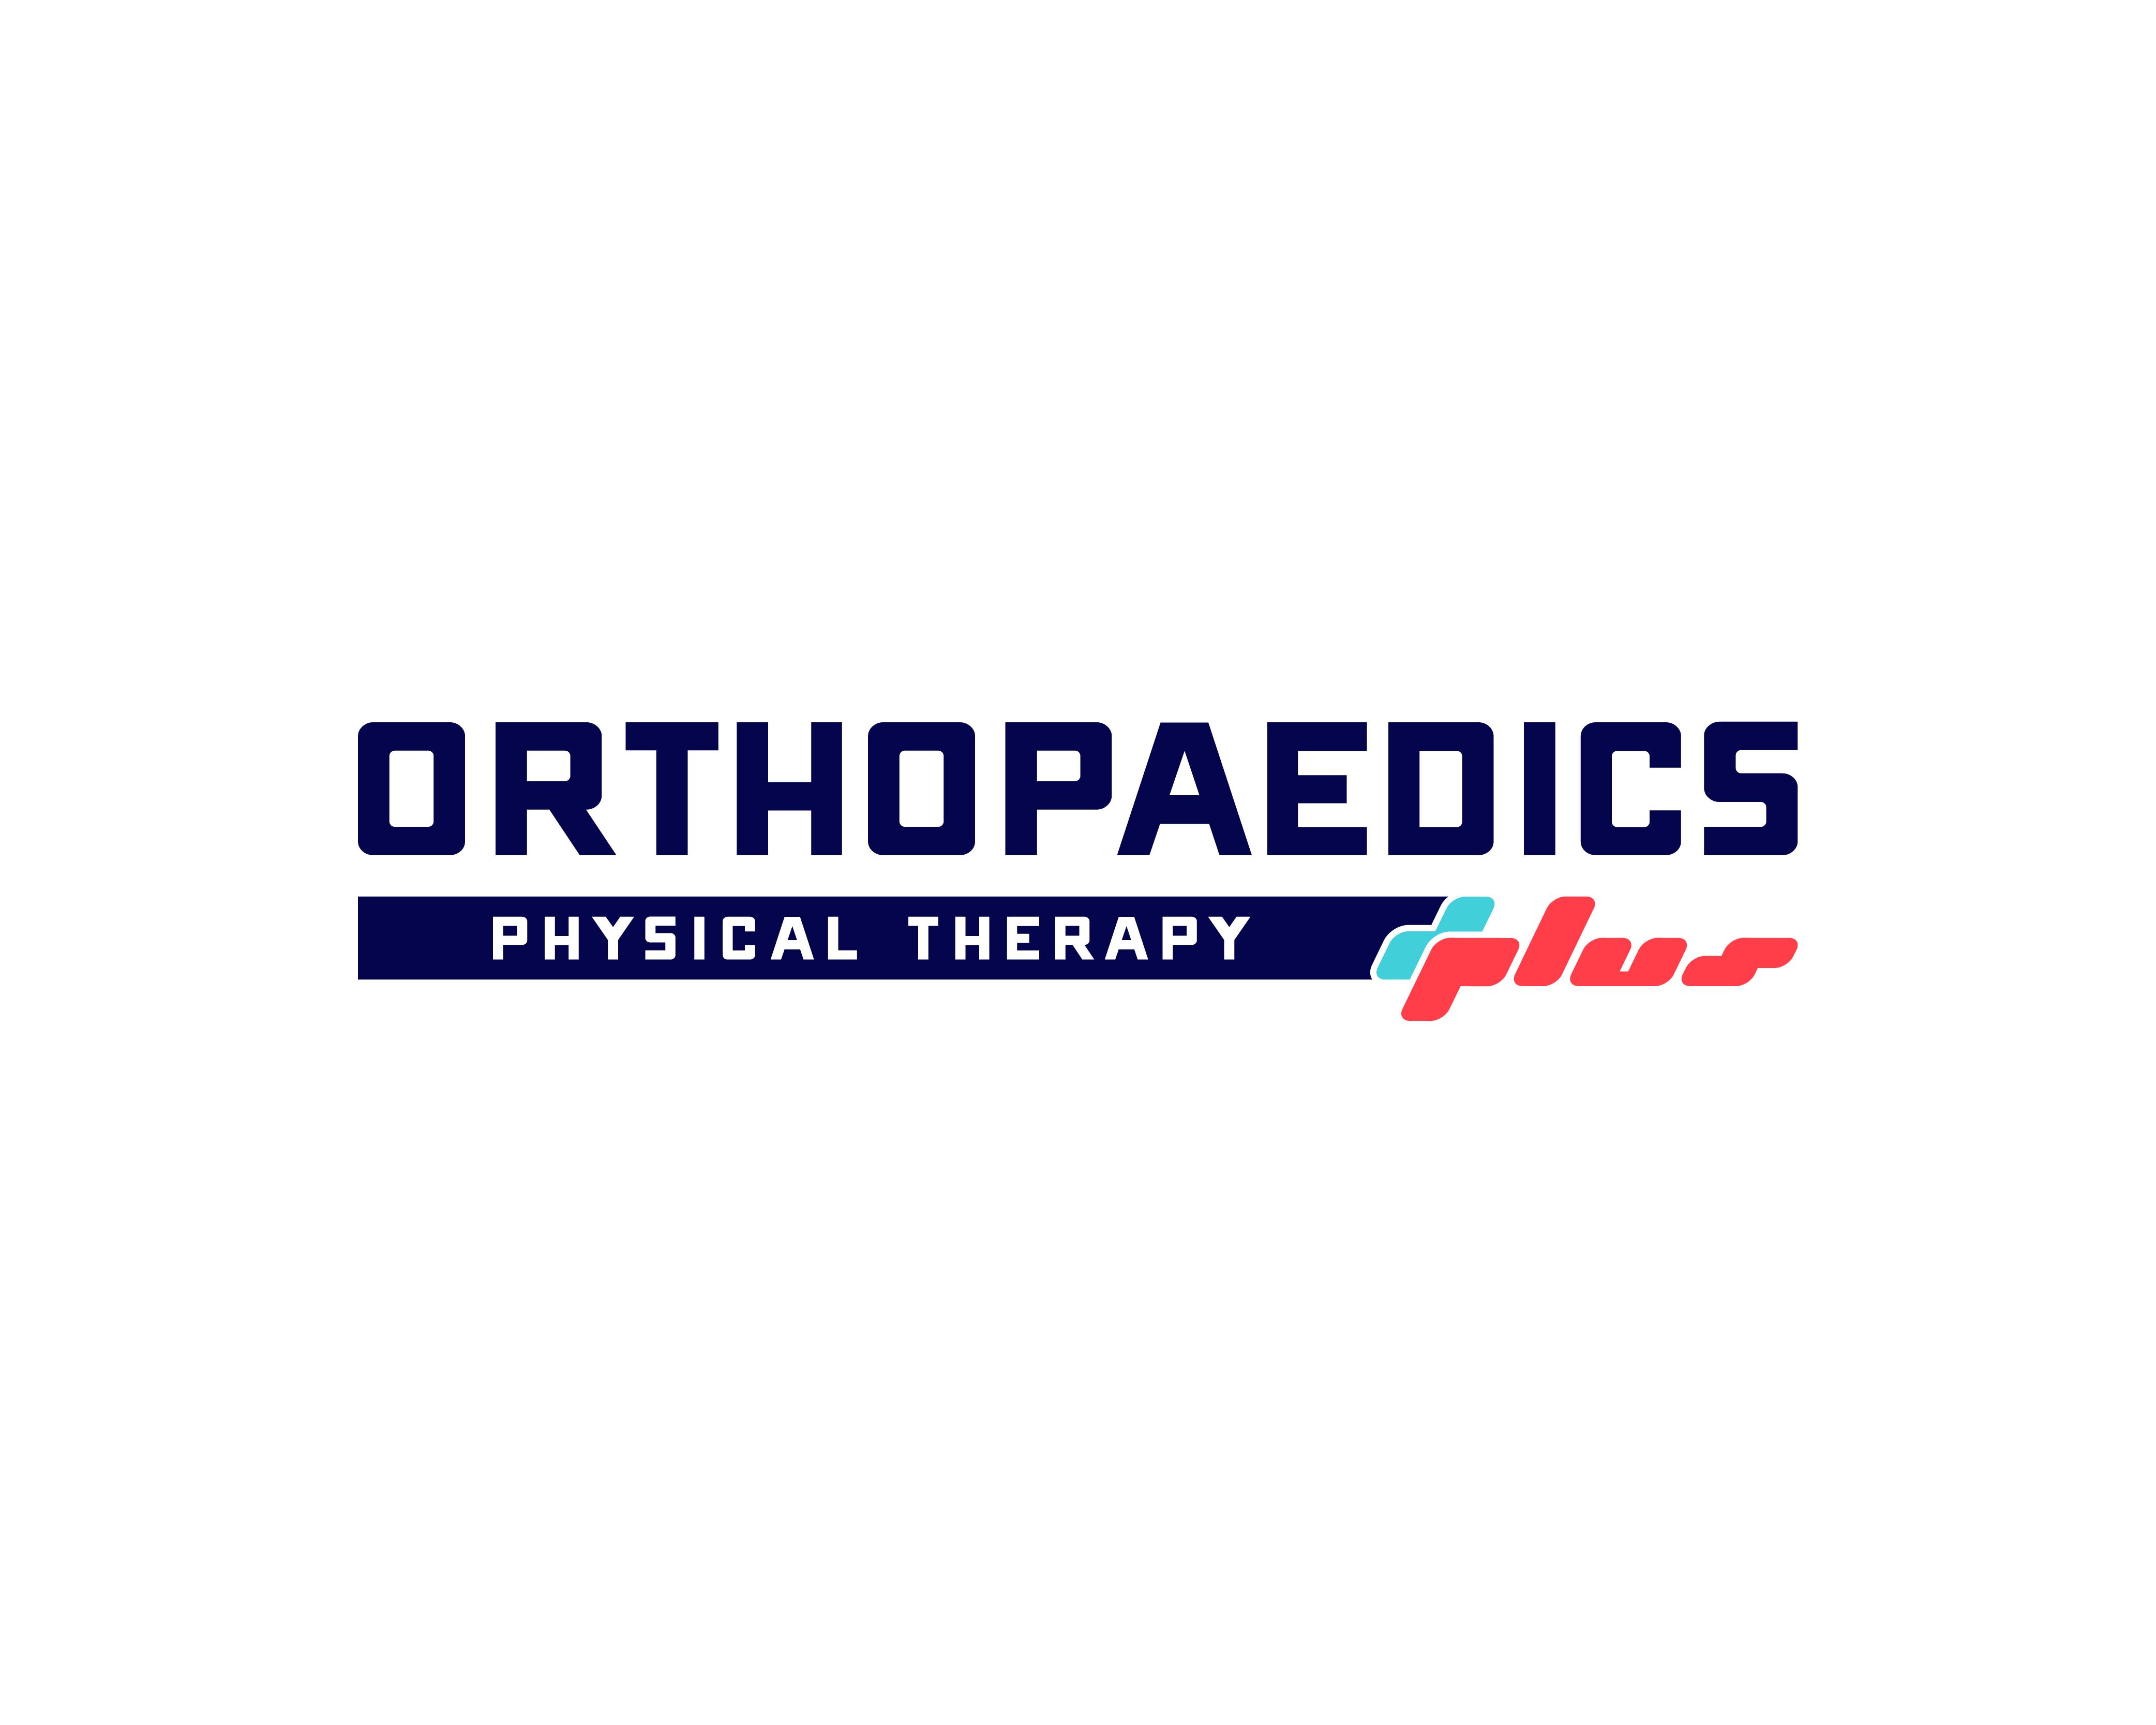 500 orthopaedics plus logo 37